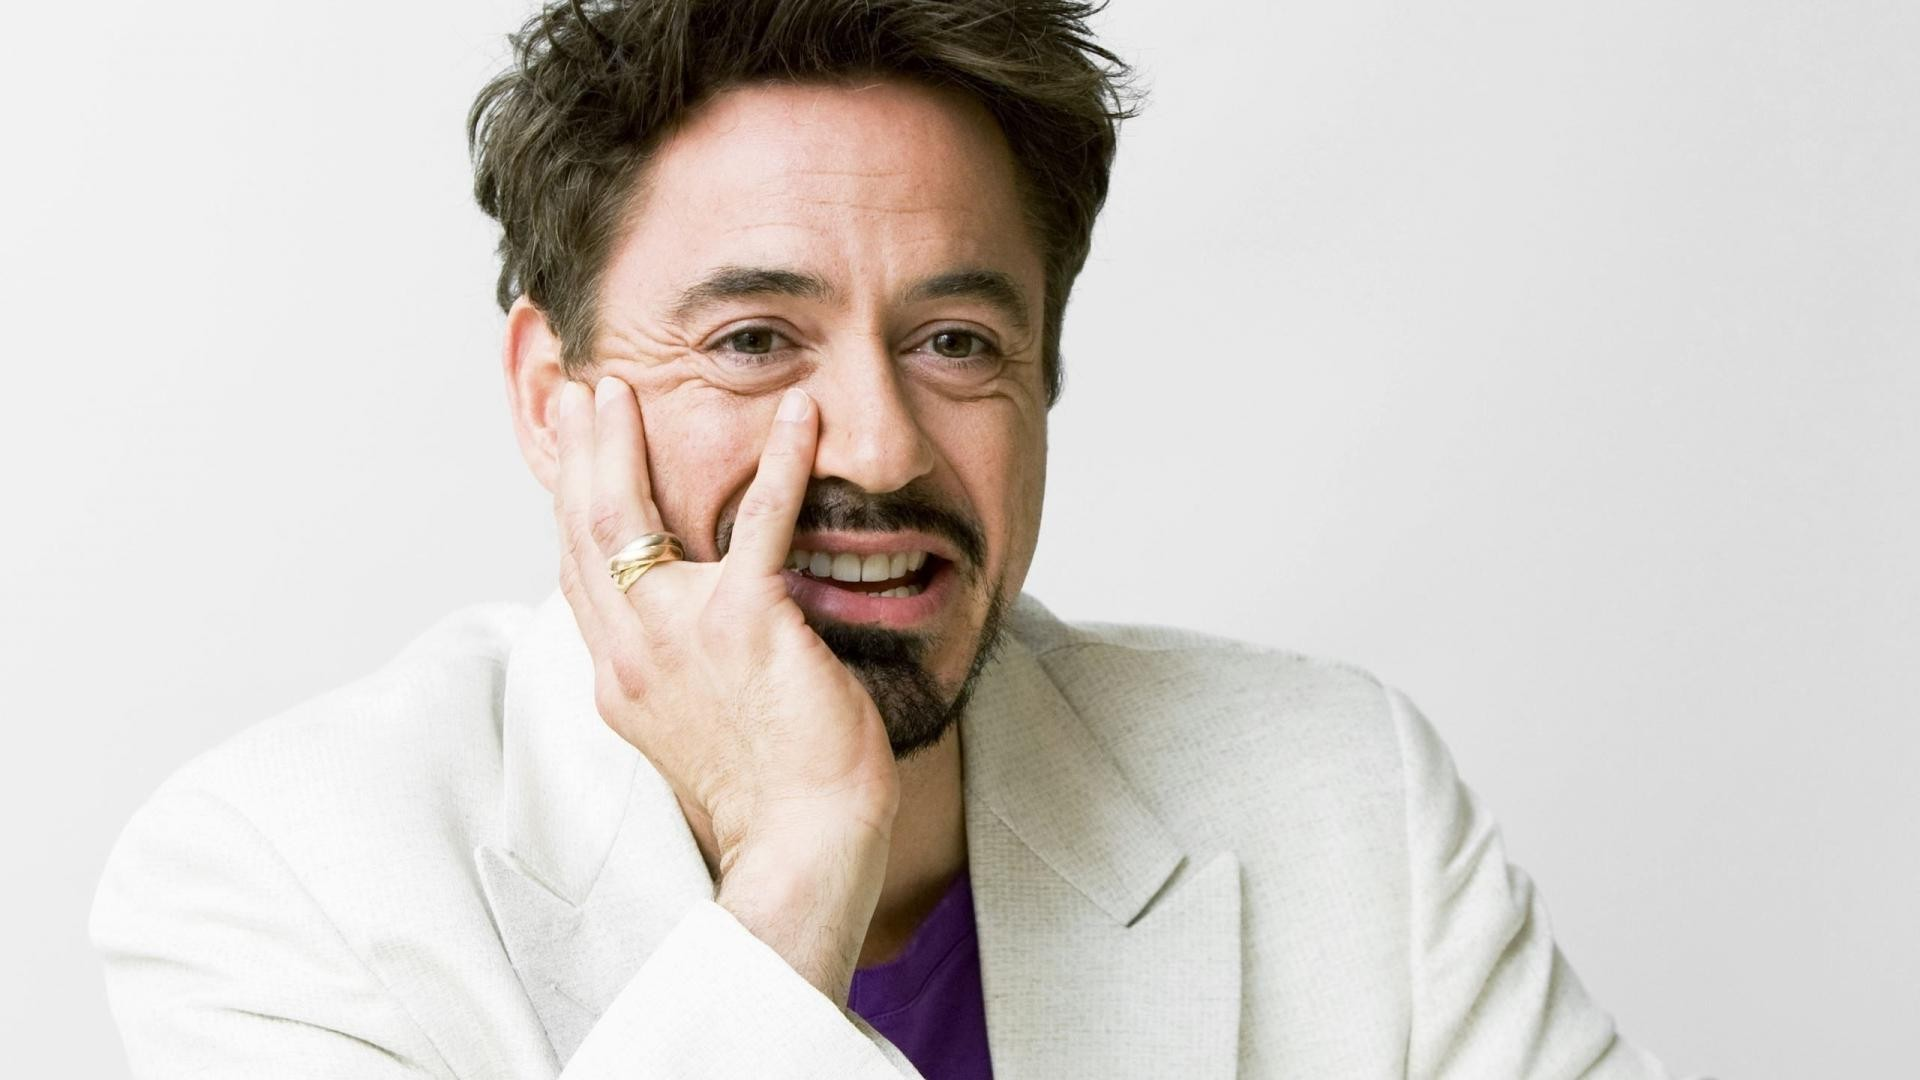 20 Hd Robert Downey Jr Wallpapers